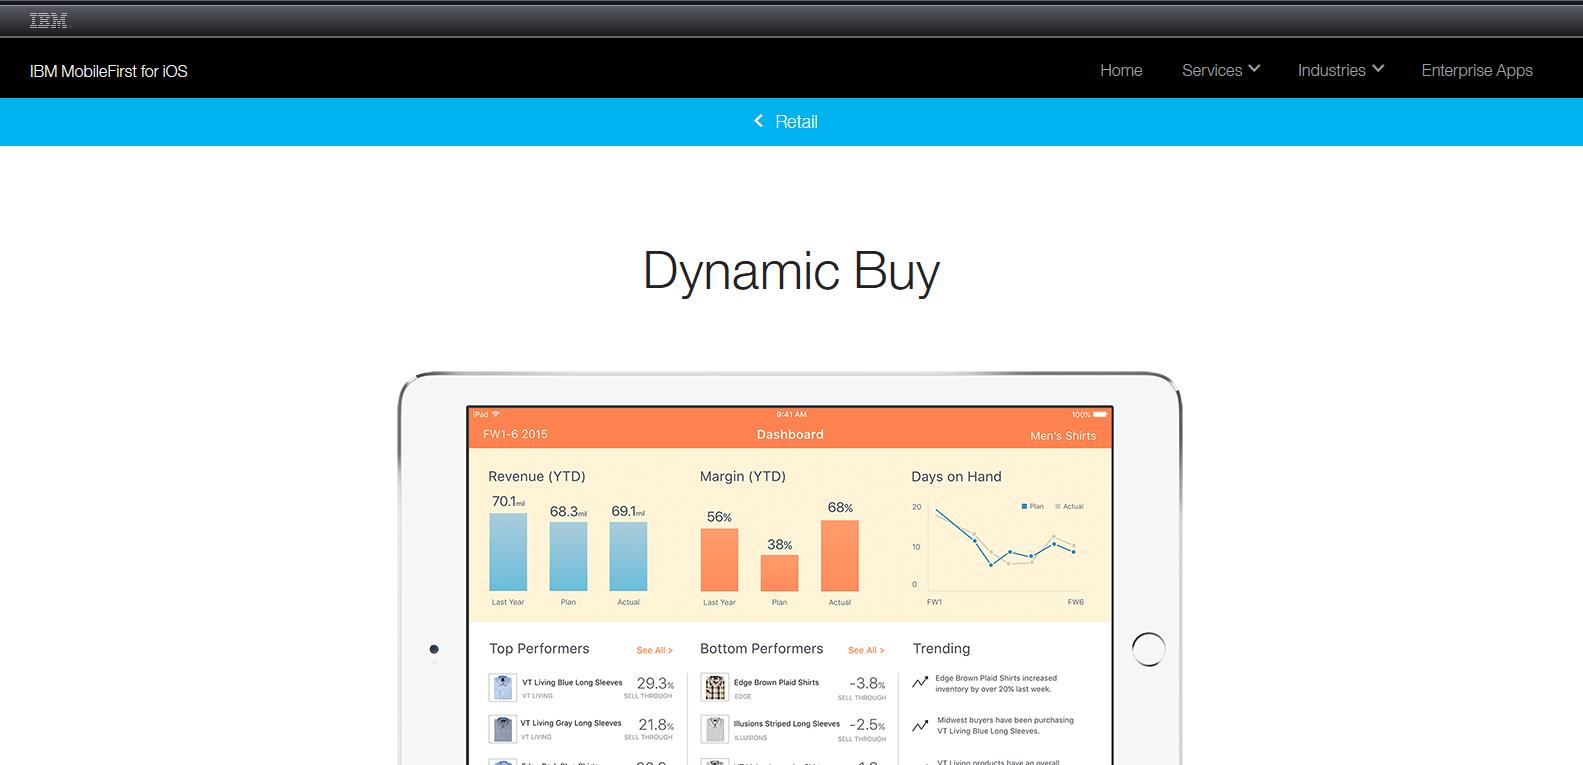 Dynamic Buy